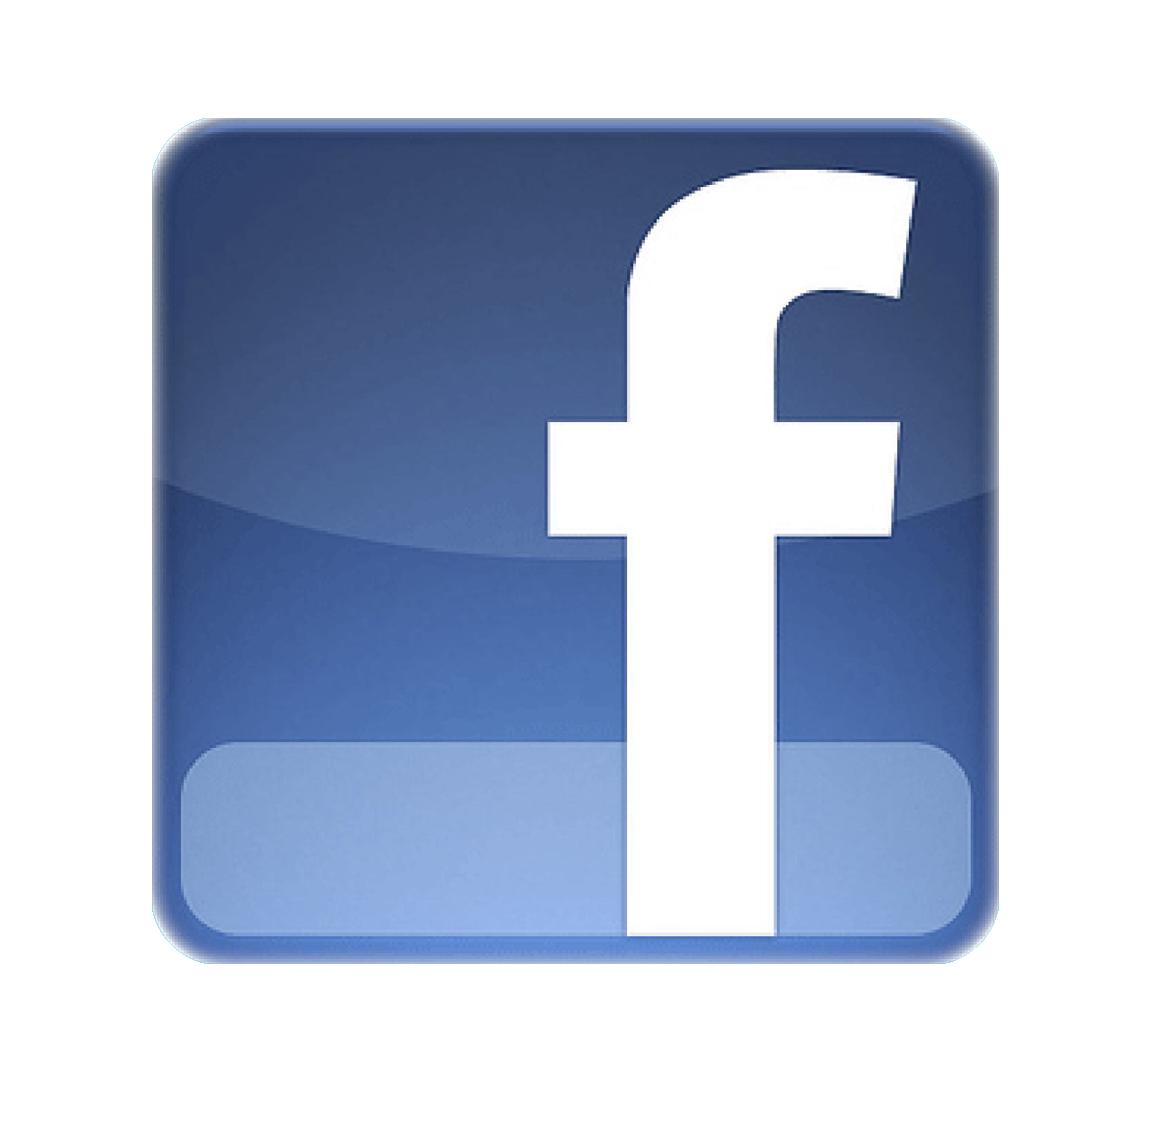 Tambien en facebook y twitter #6.